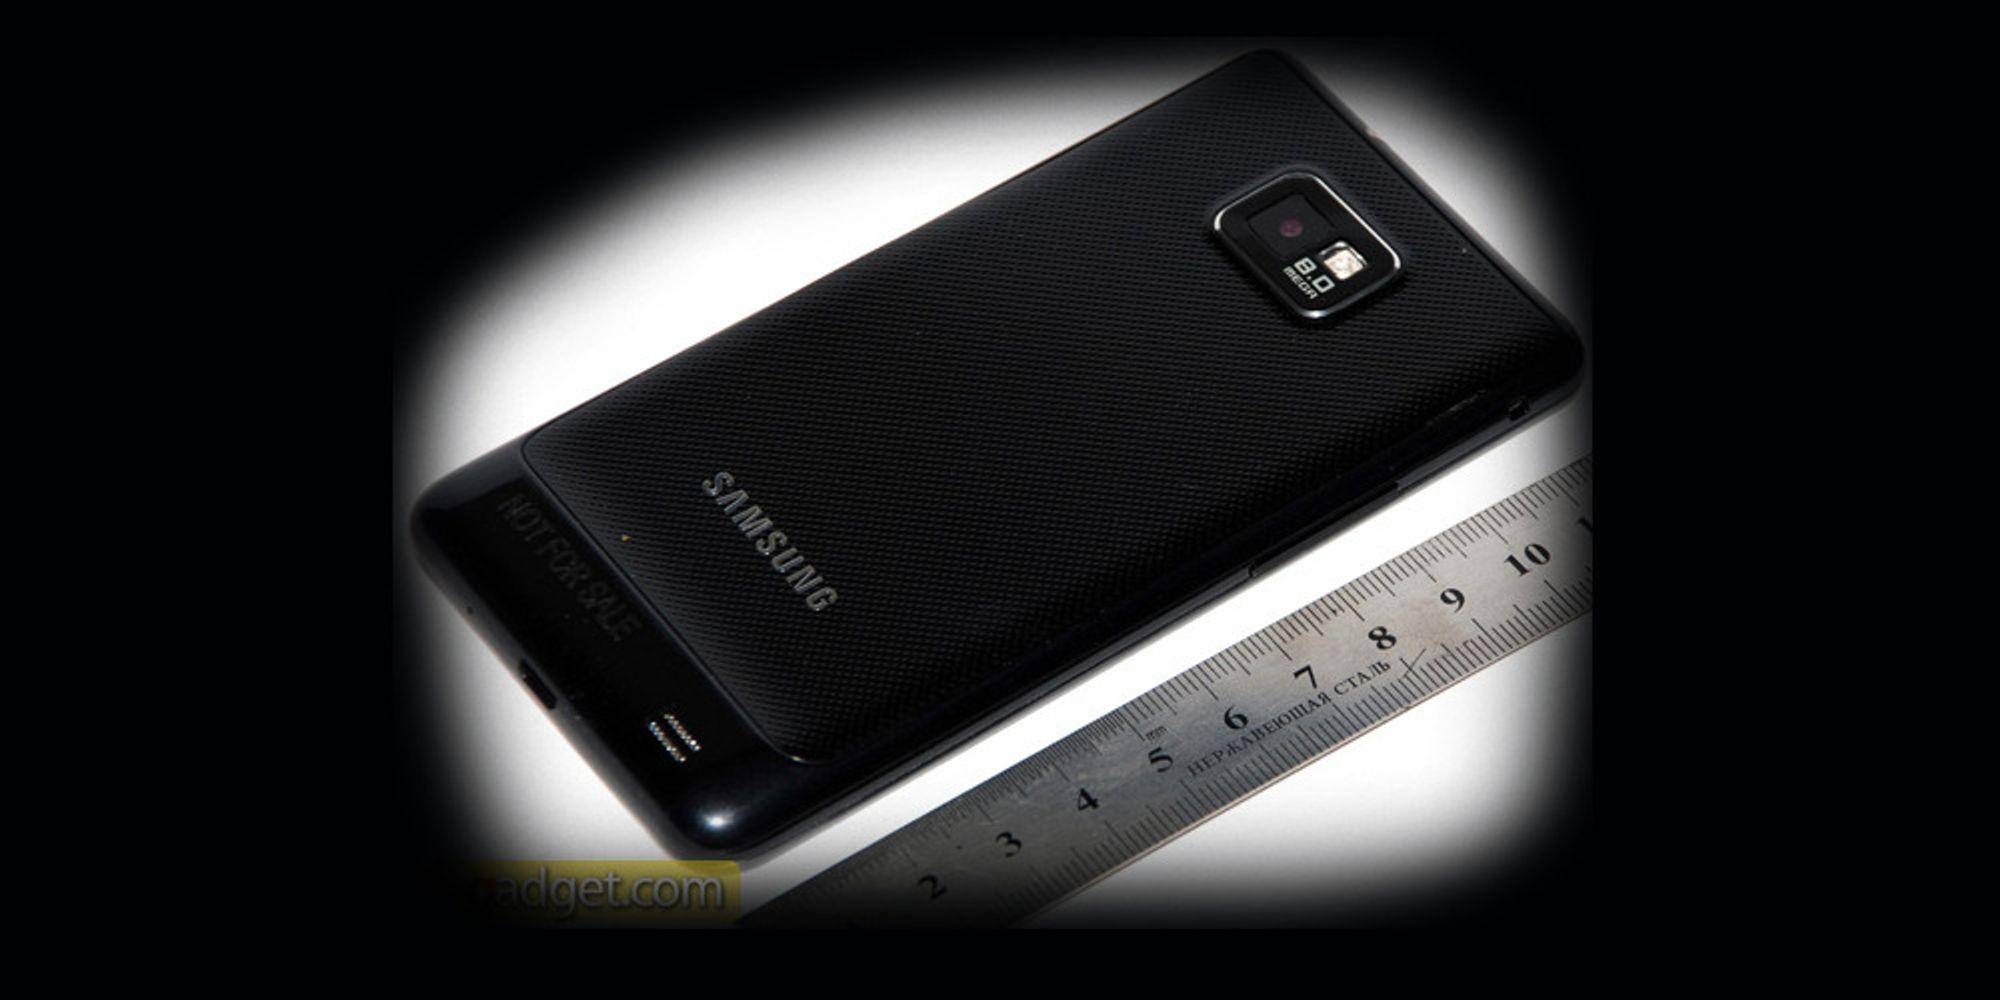 Galaxy S II er testet